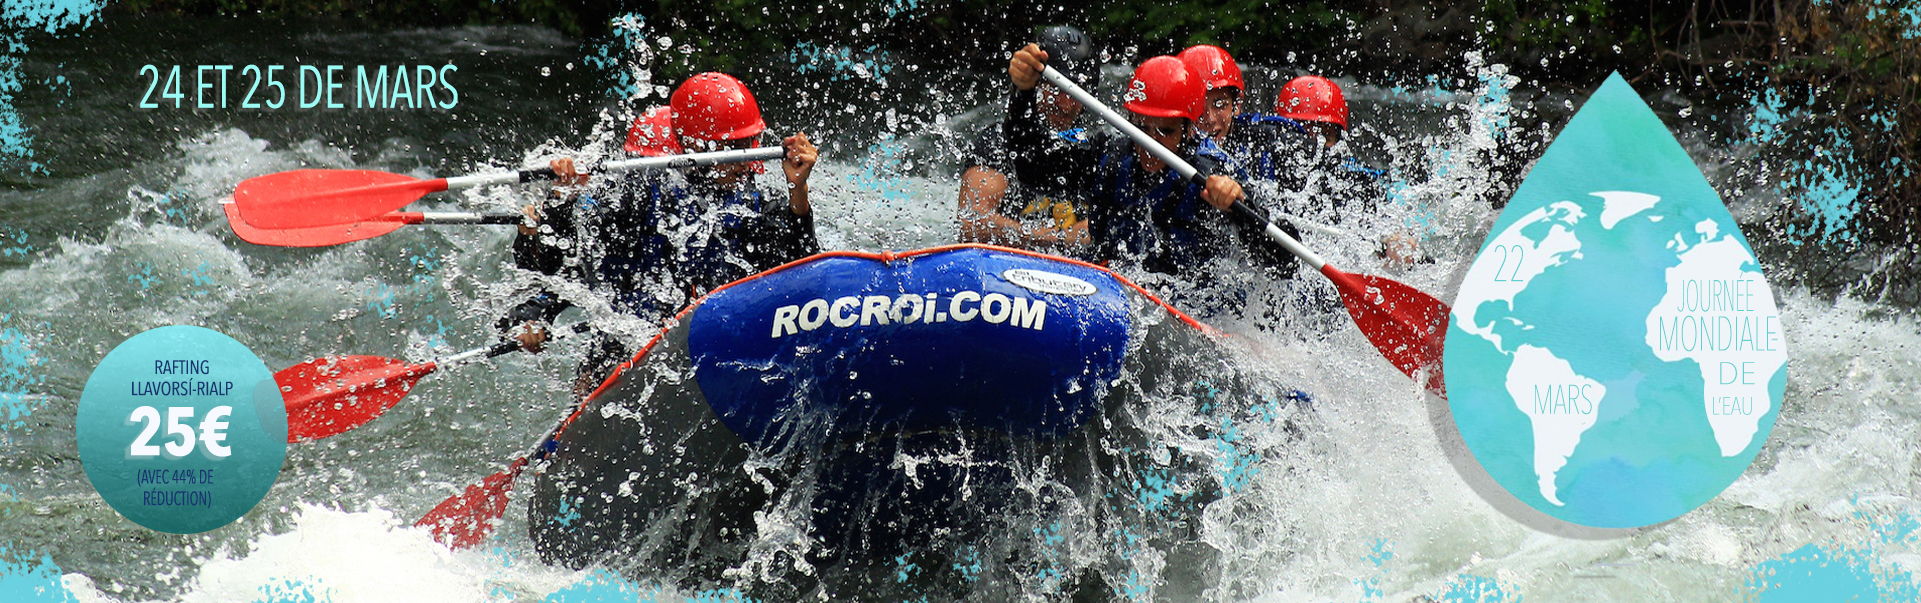 Saison Rafting 2018